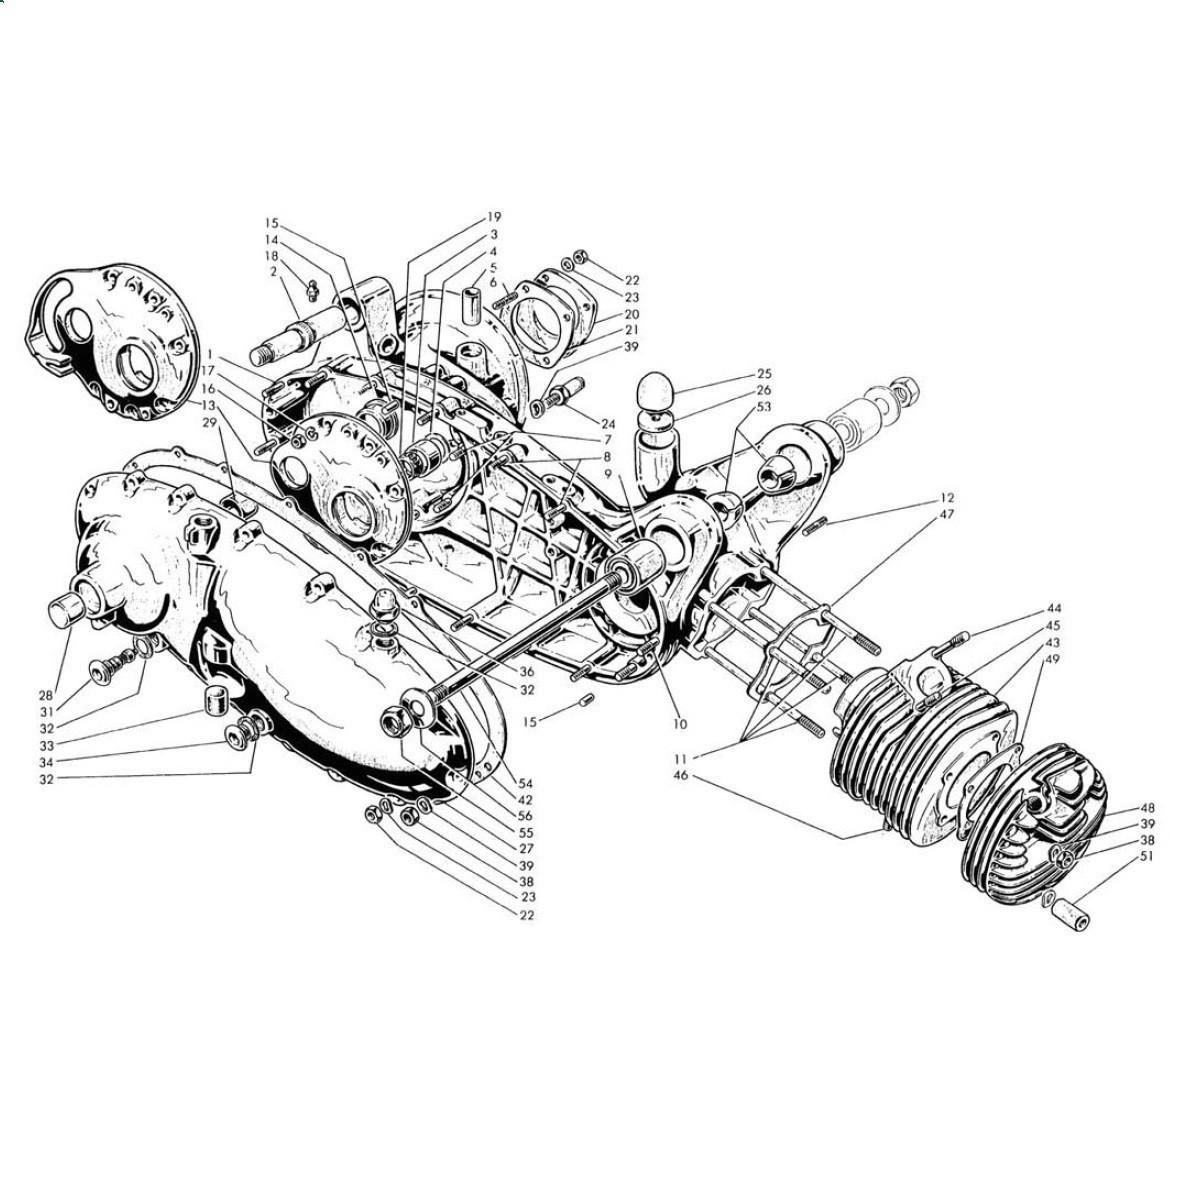 Carter Motore e Cilindro (Tav.1)